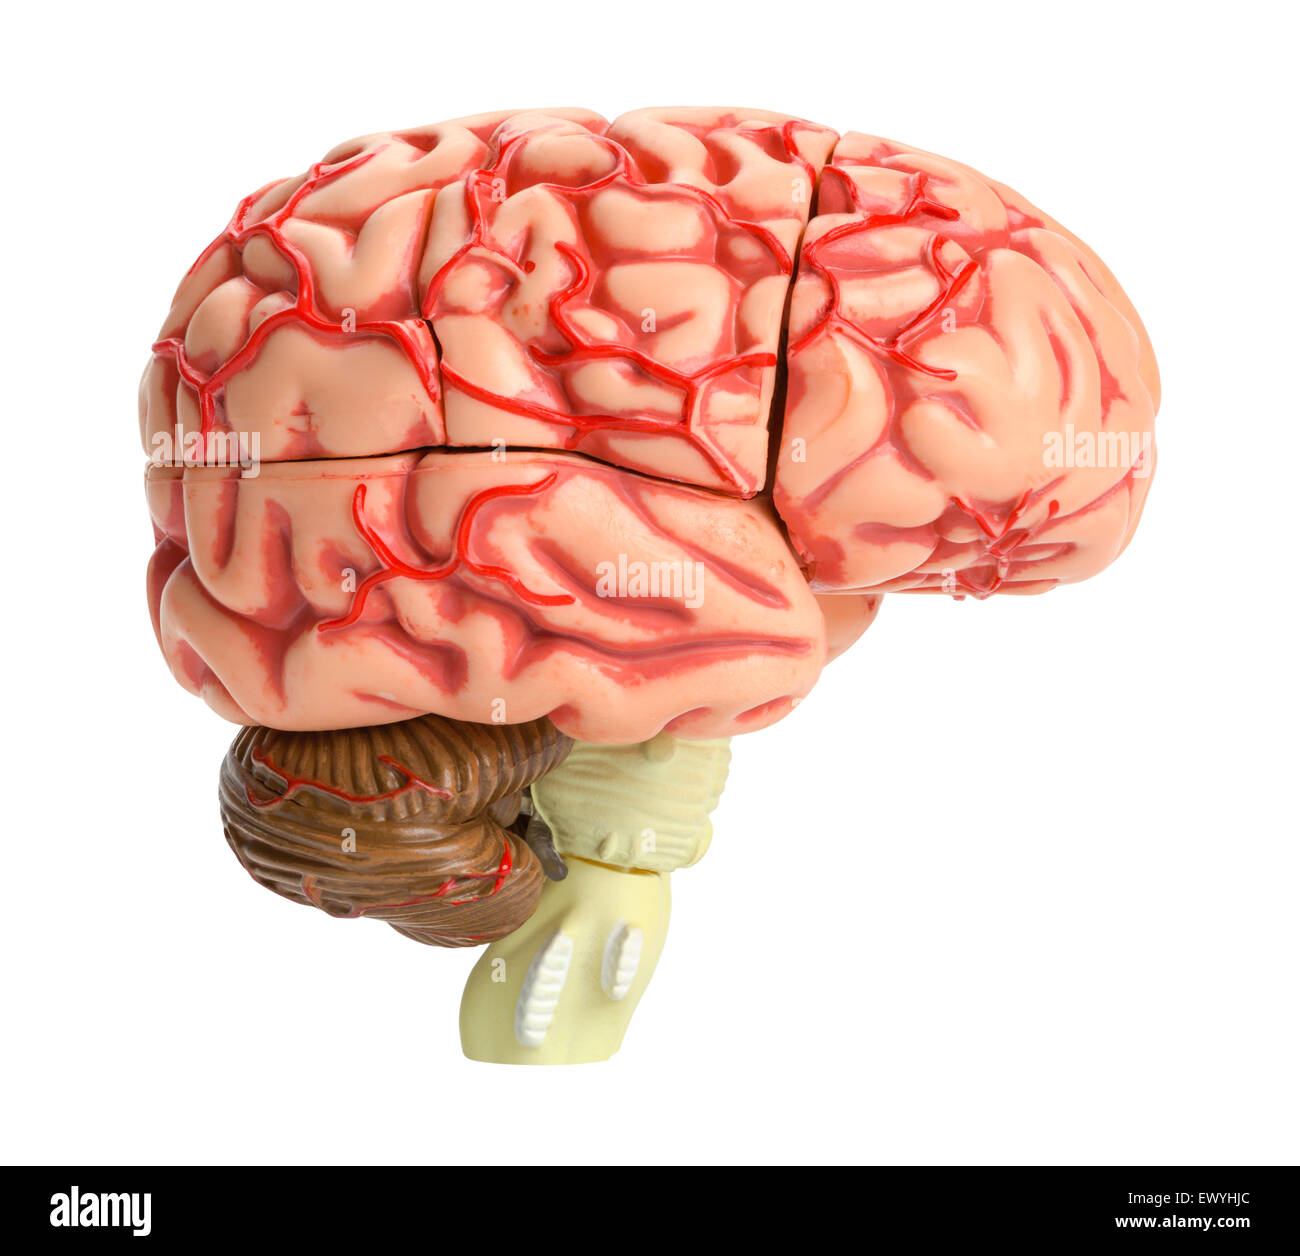 Vista lateral del modelo de cerebro humano aislado sobre fondo blanco. Imagen De Stock